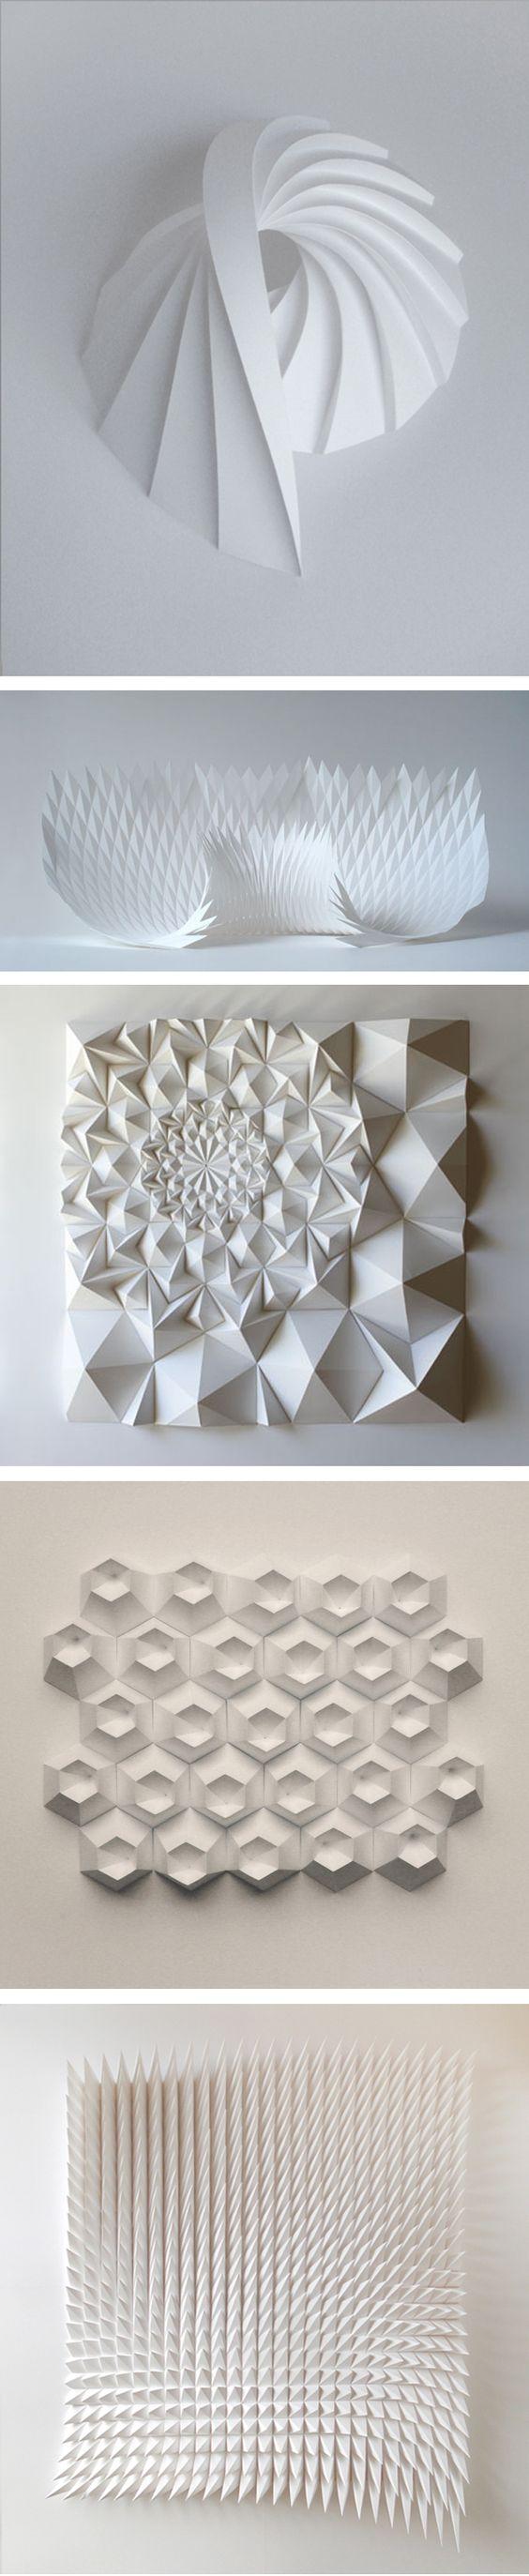 Paper sculpture: